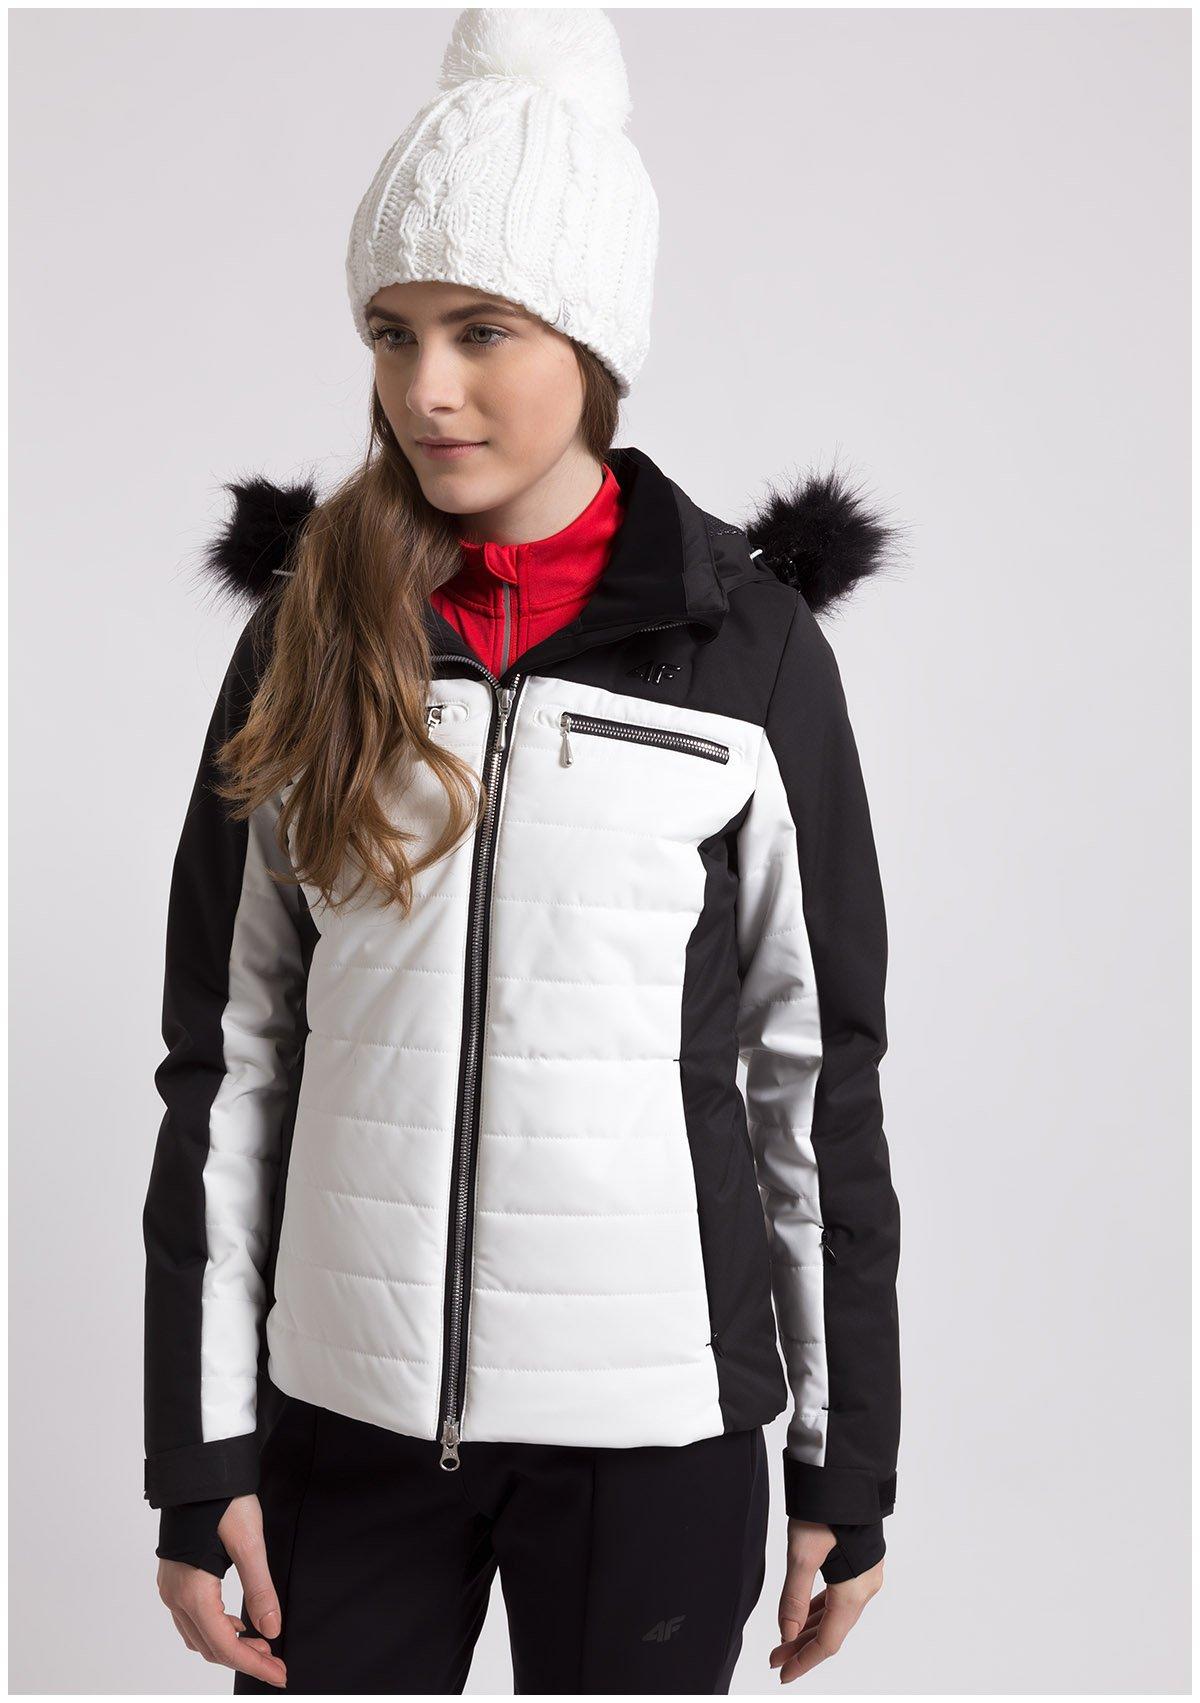 Kurtka narciarska damska KUDN151 - biały